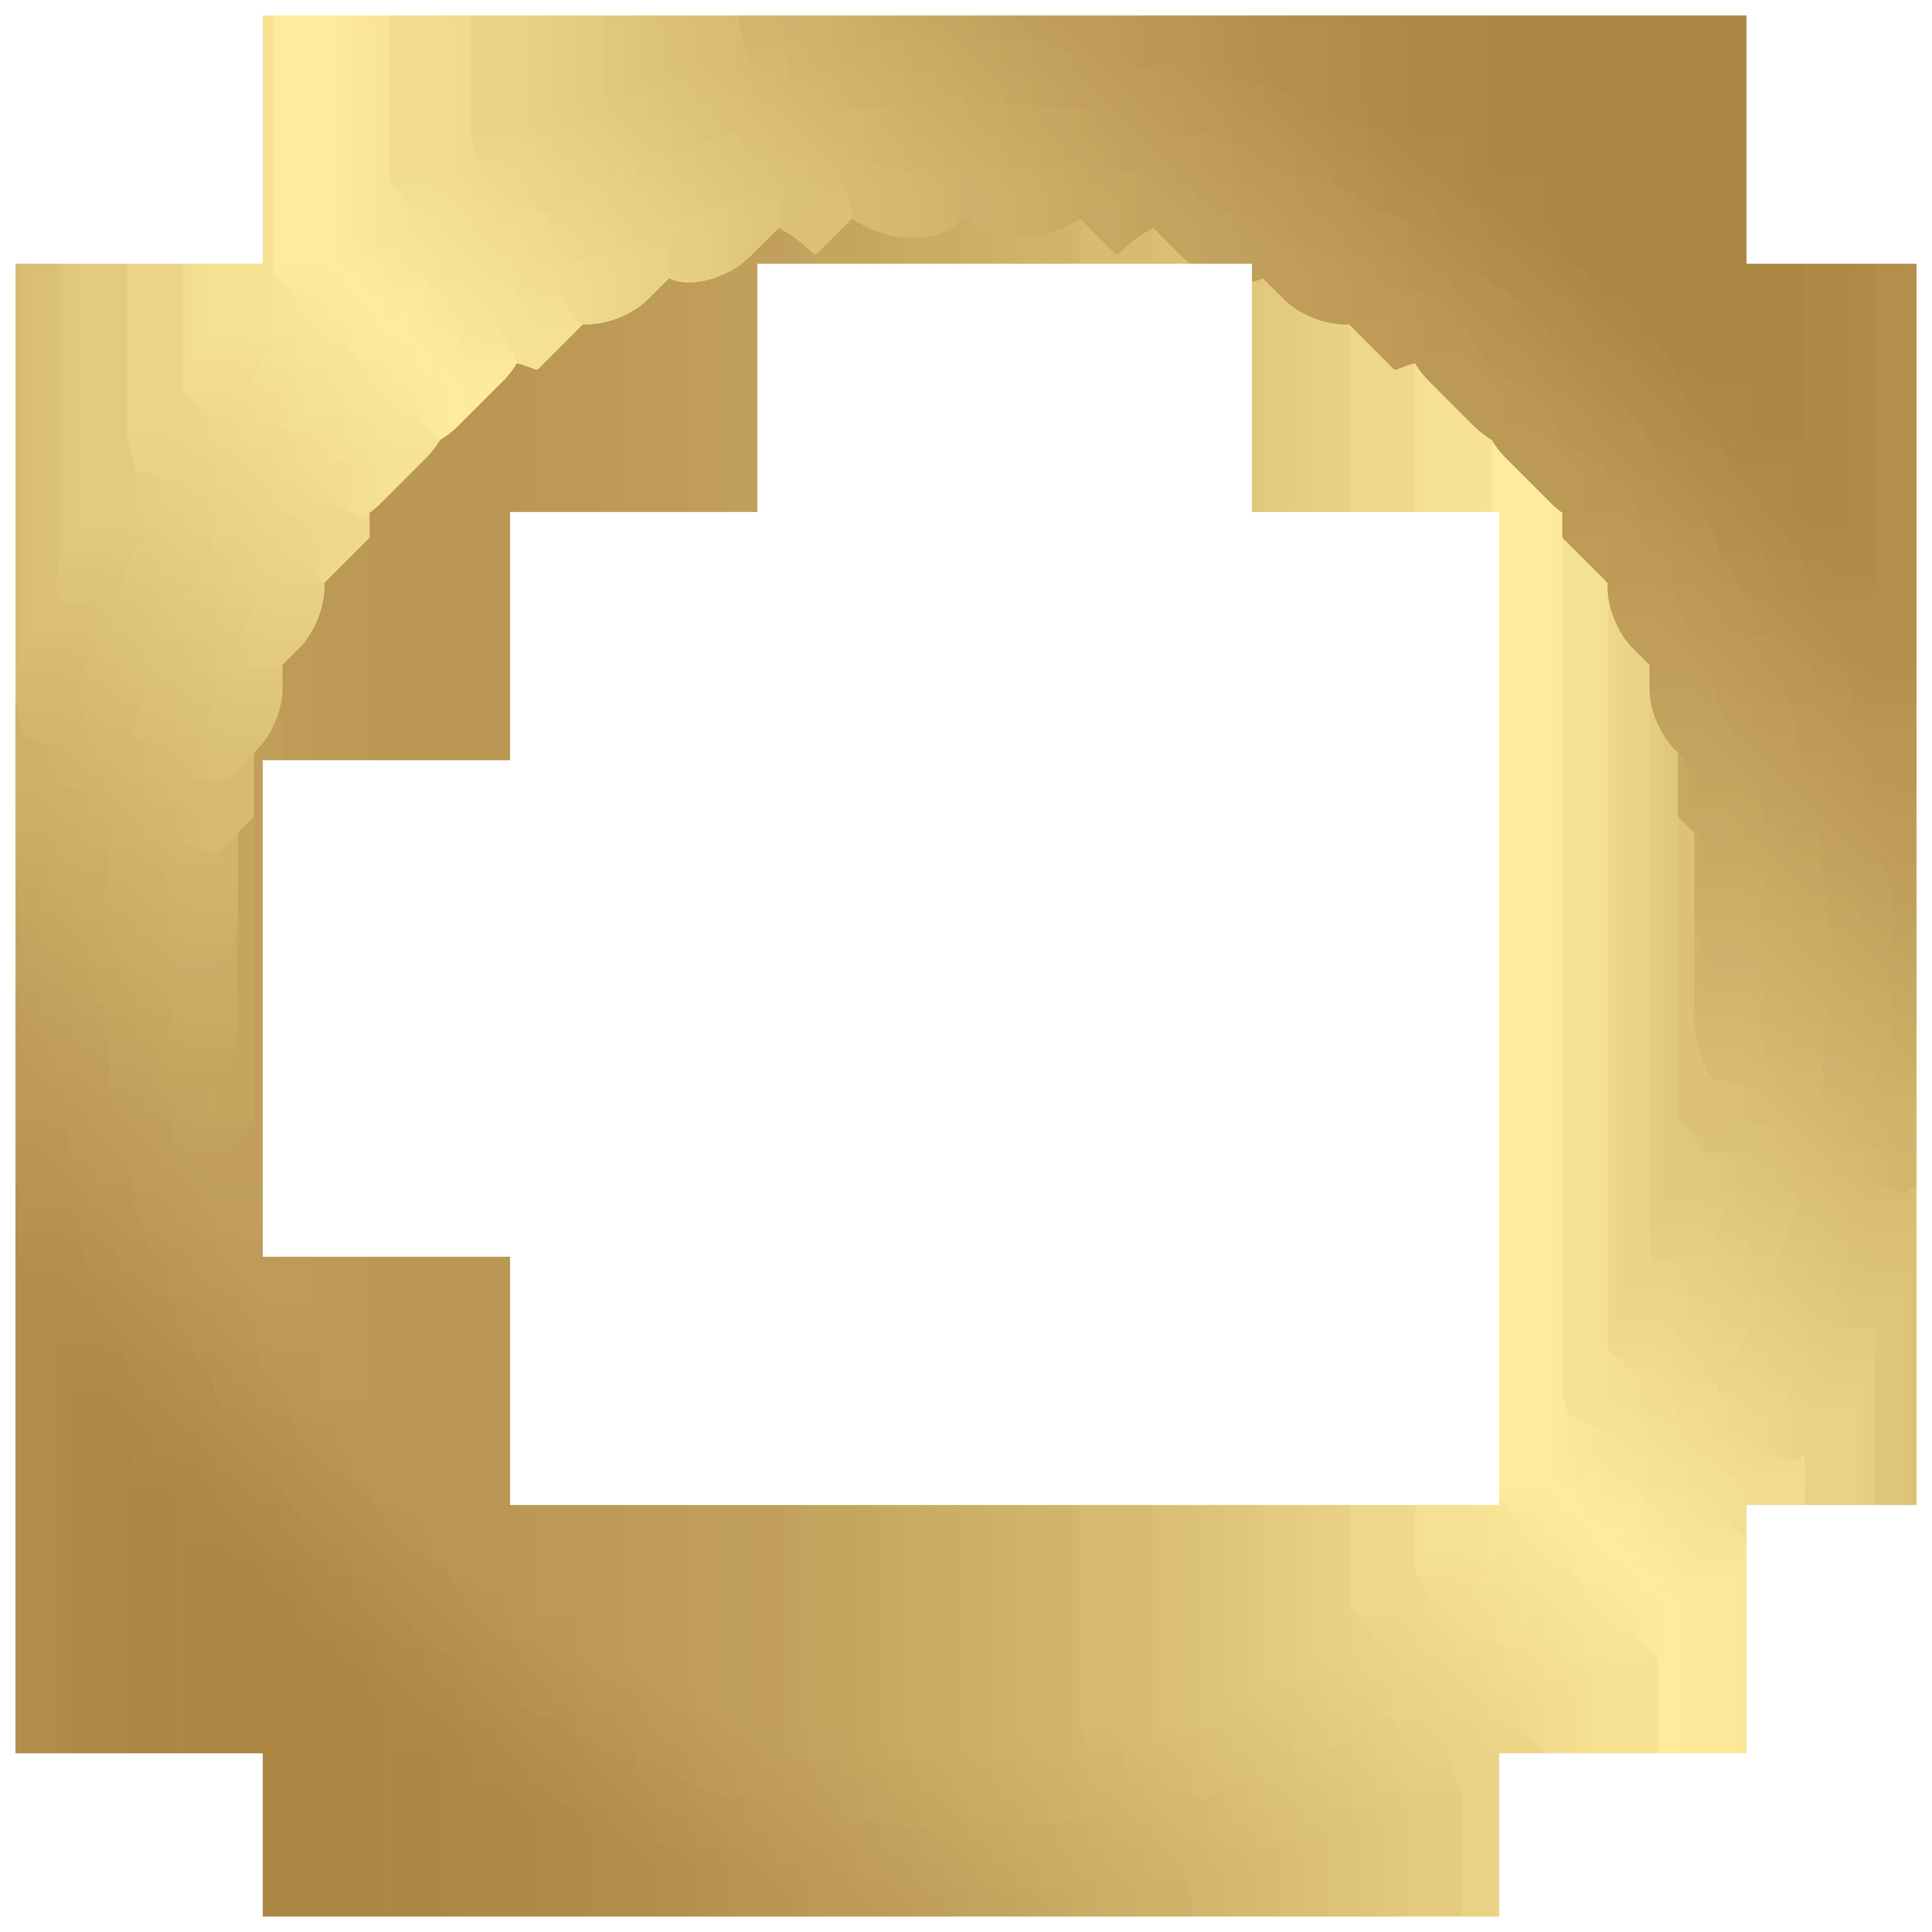 Necklace clipart border #8